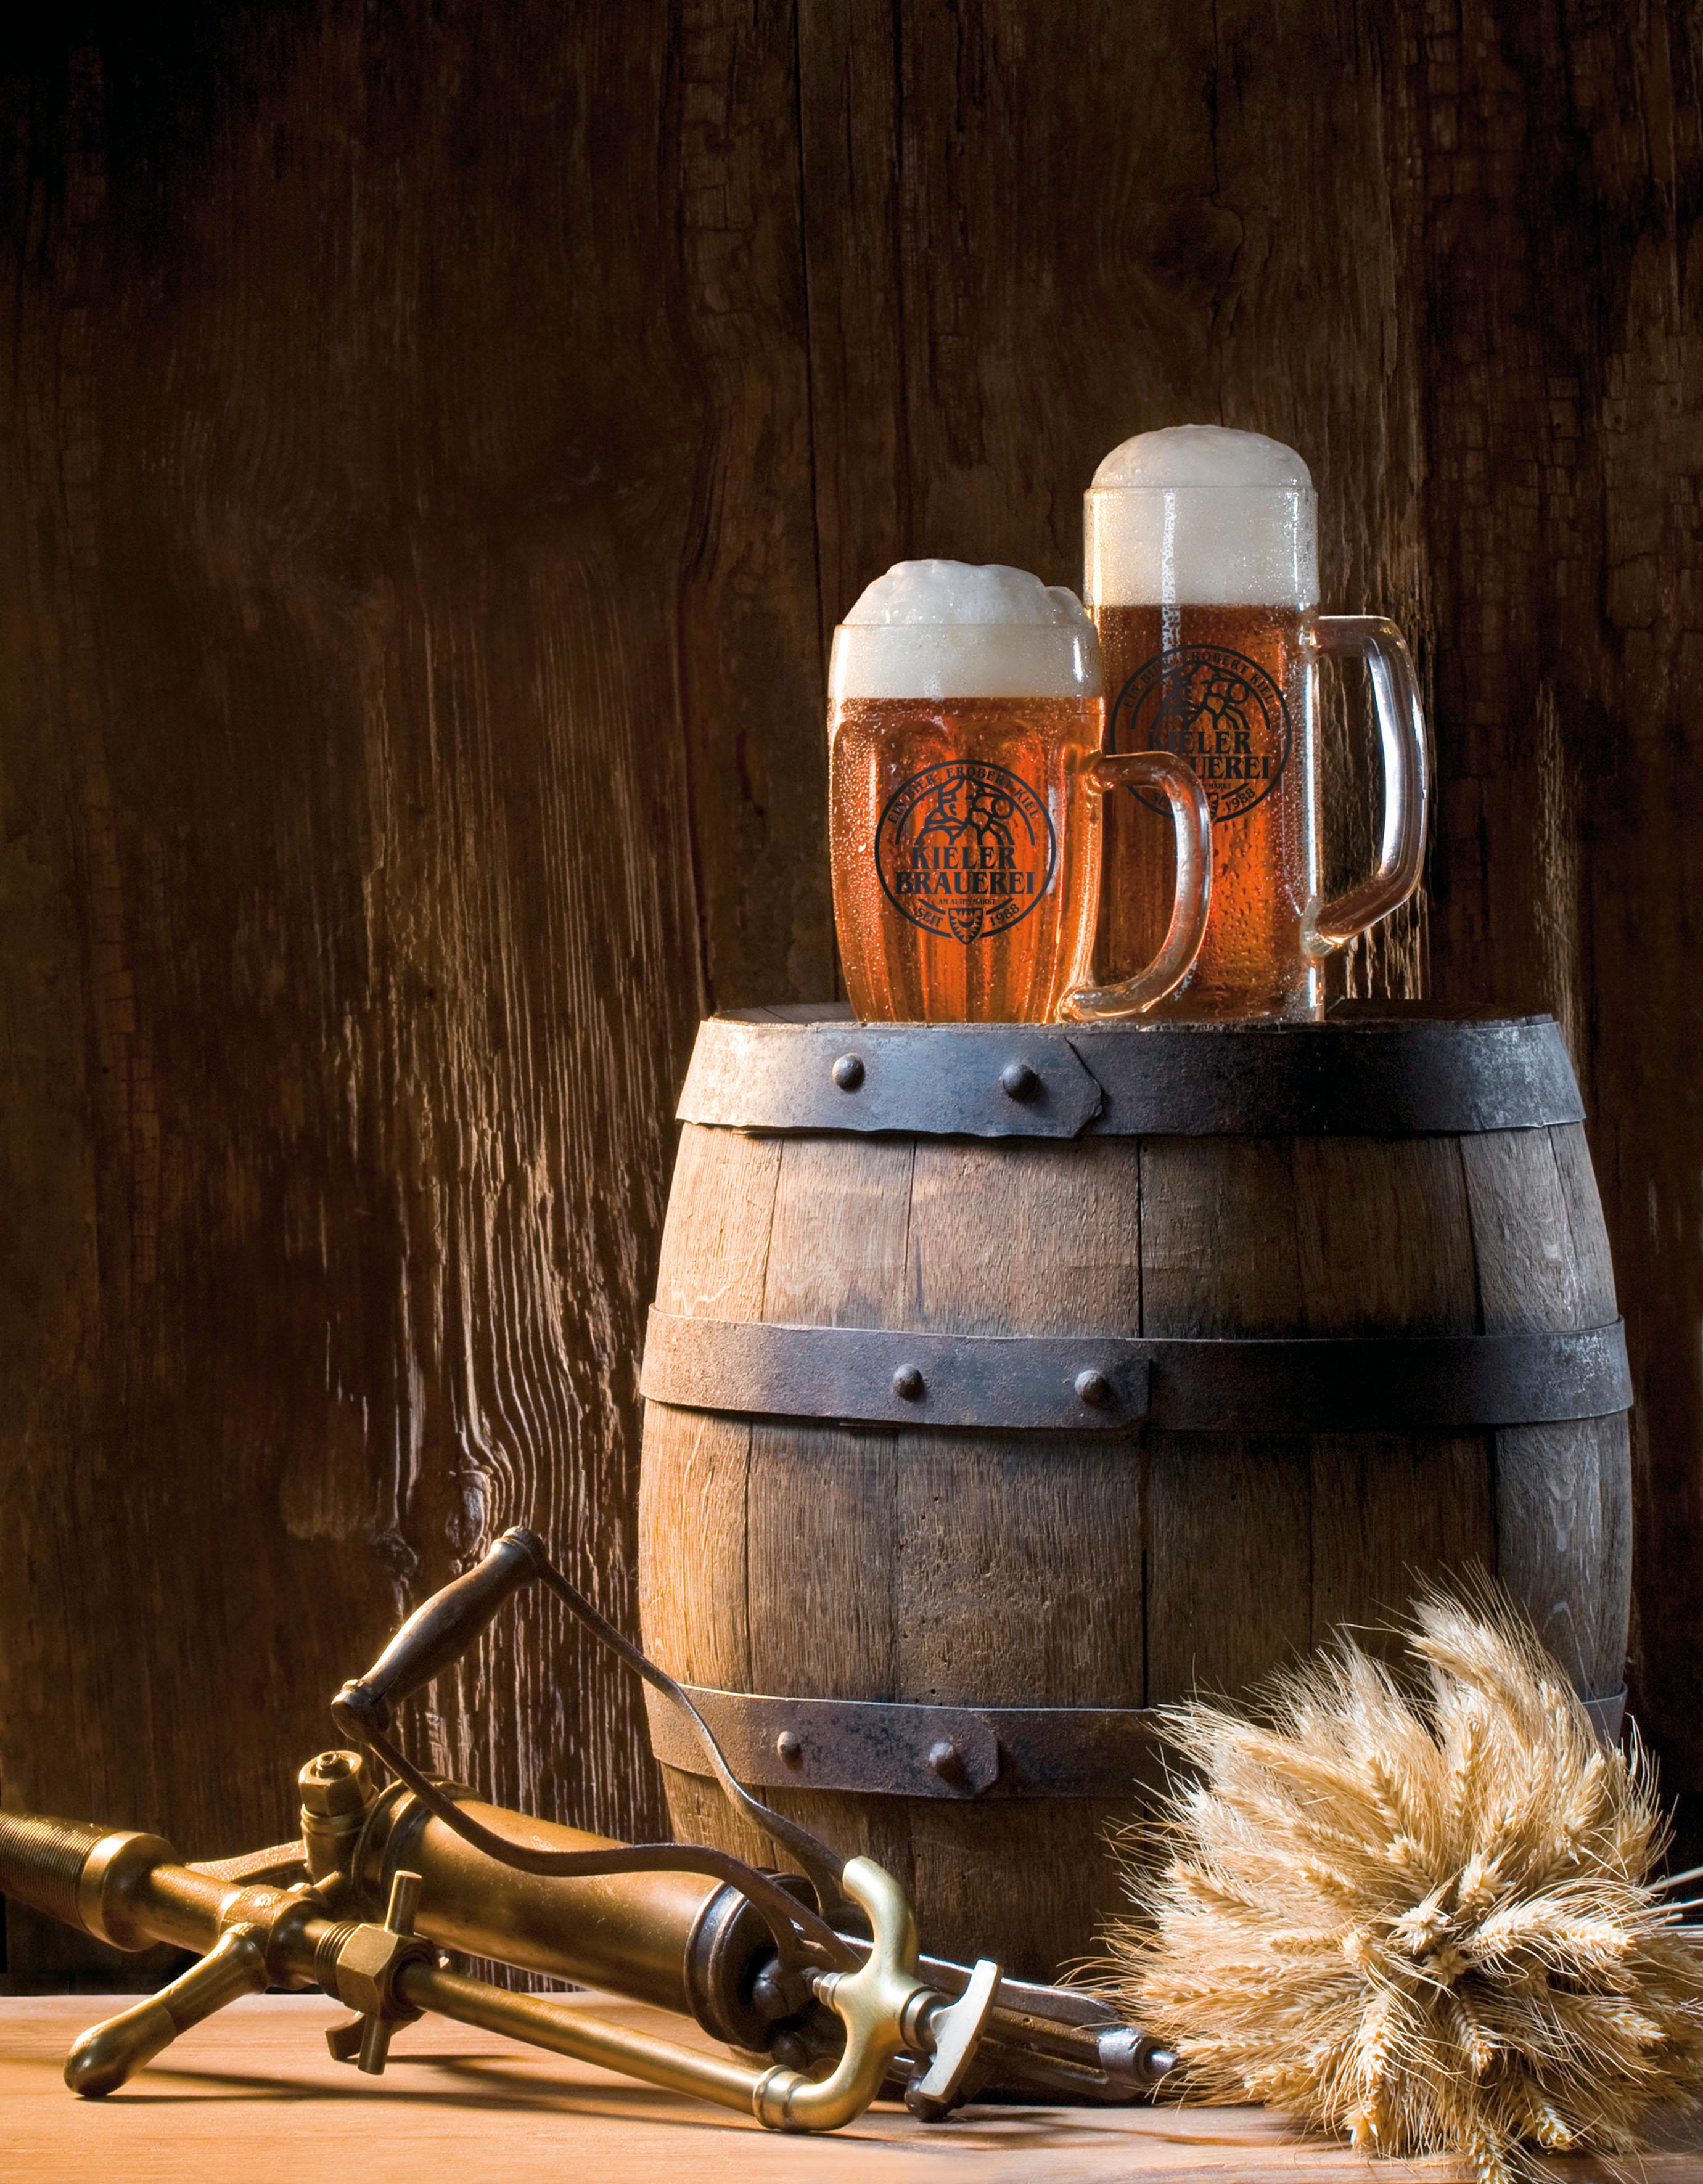 Copyright 2018 Kieler Brauerei